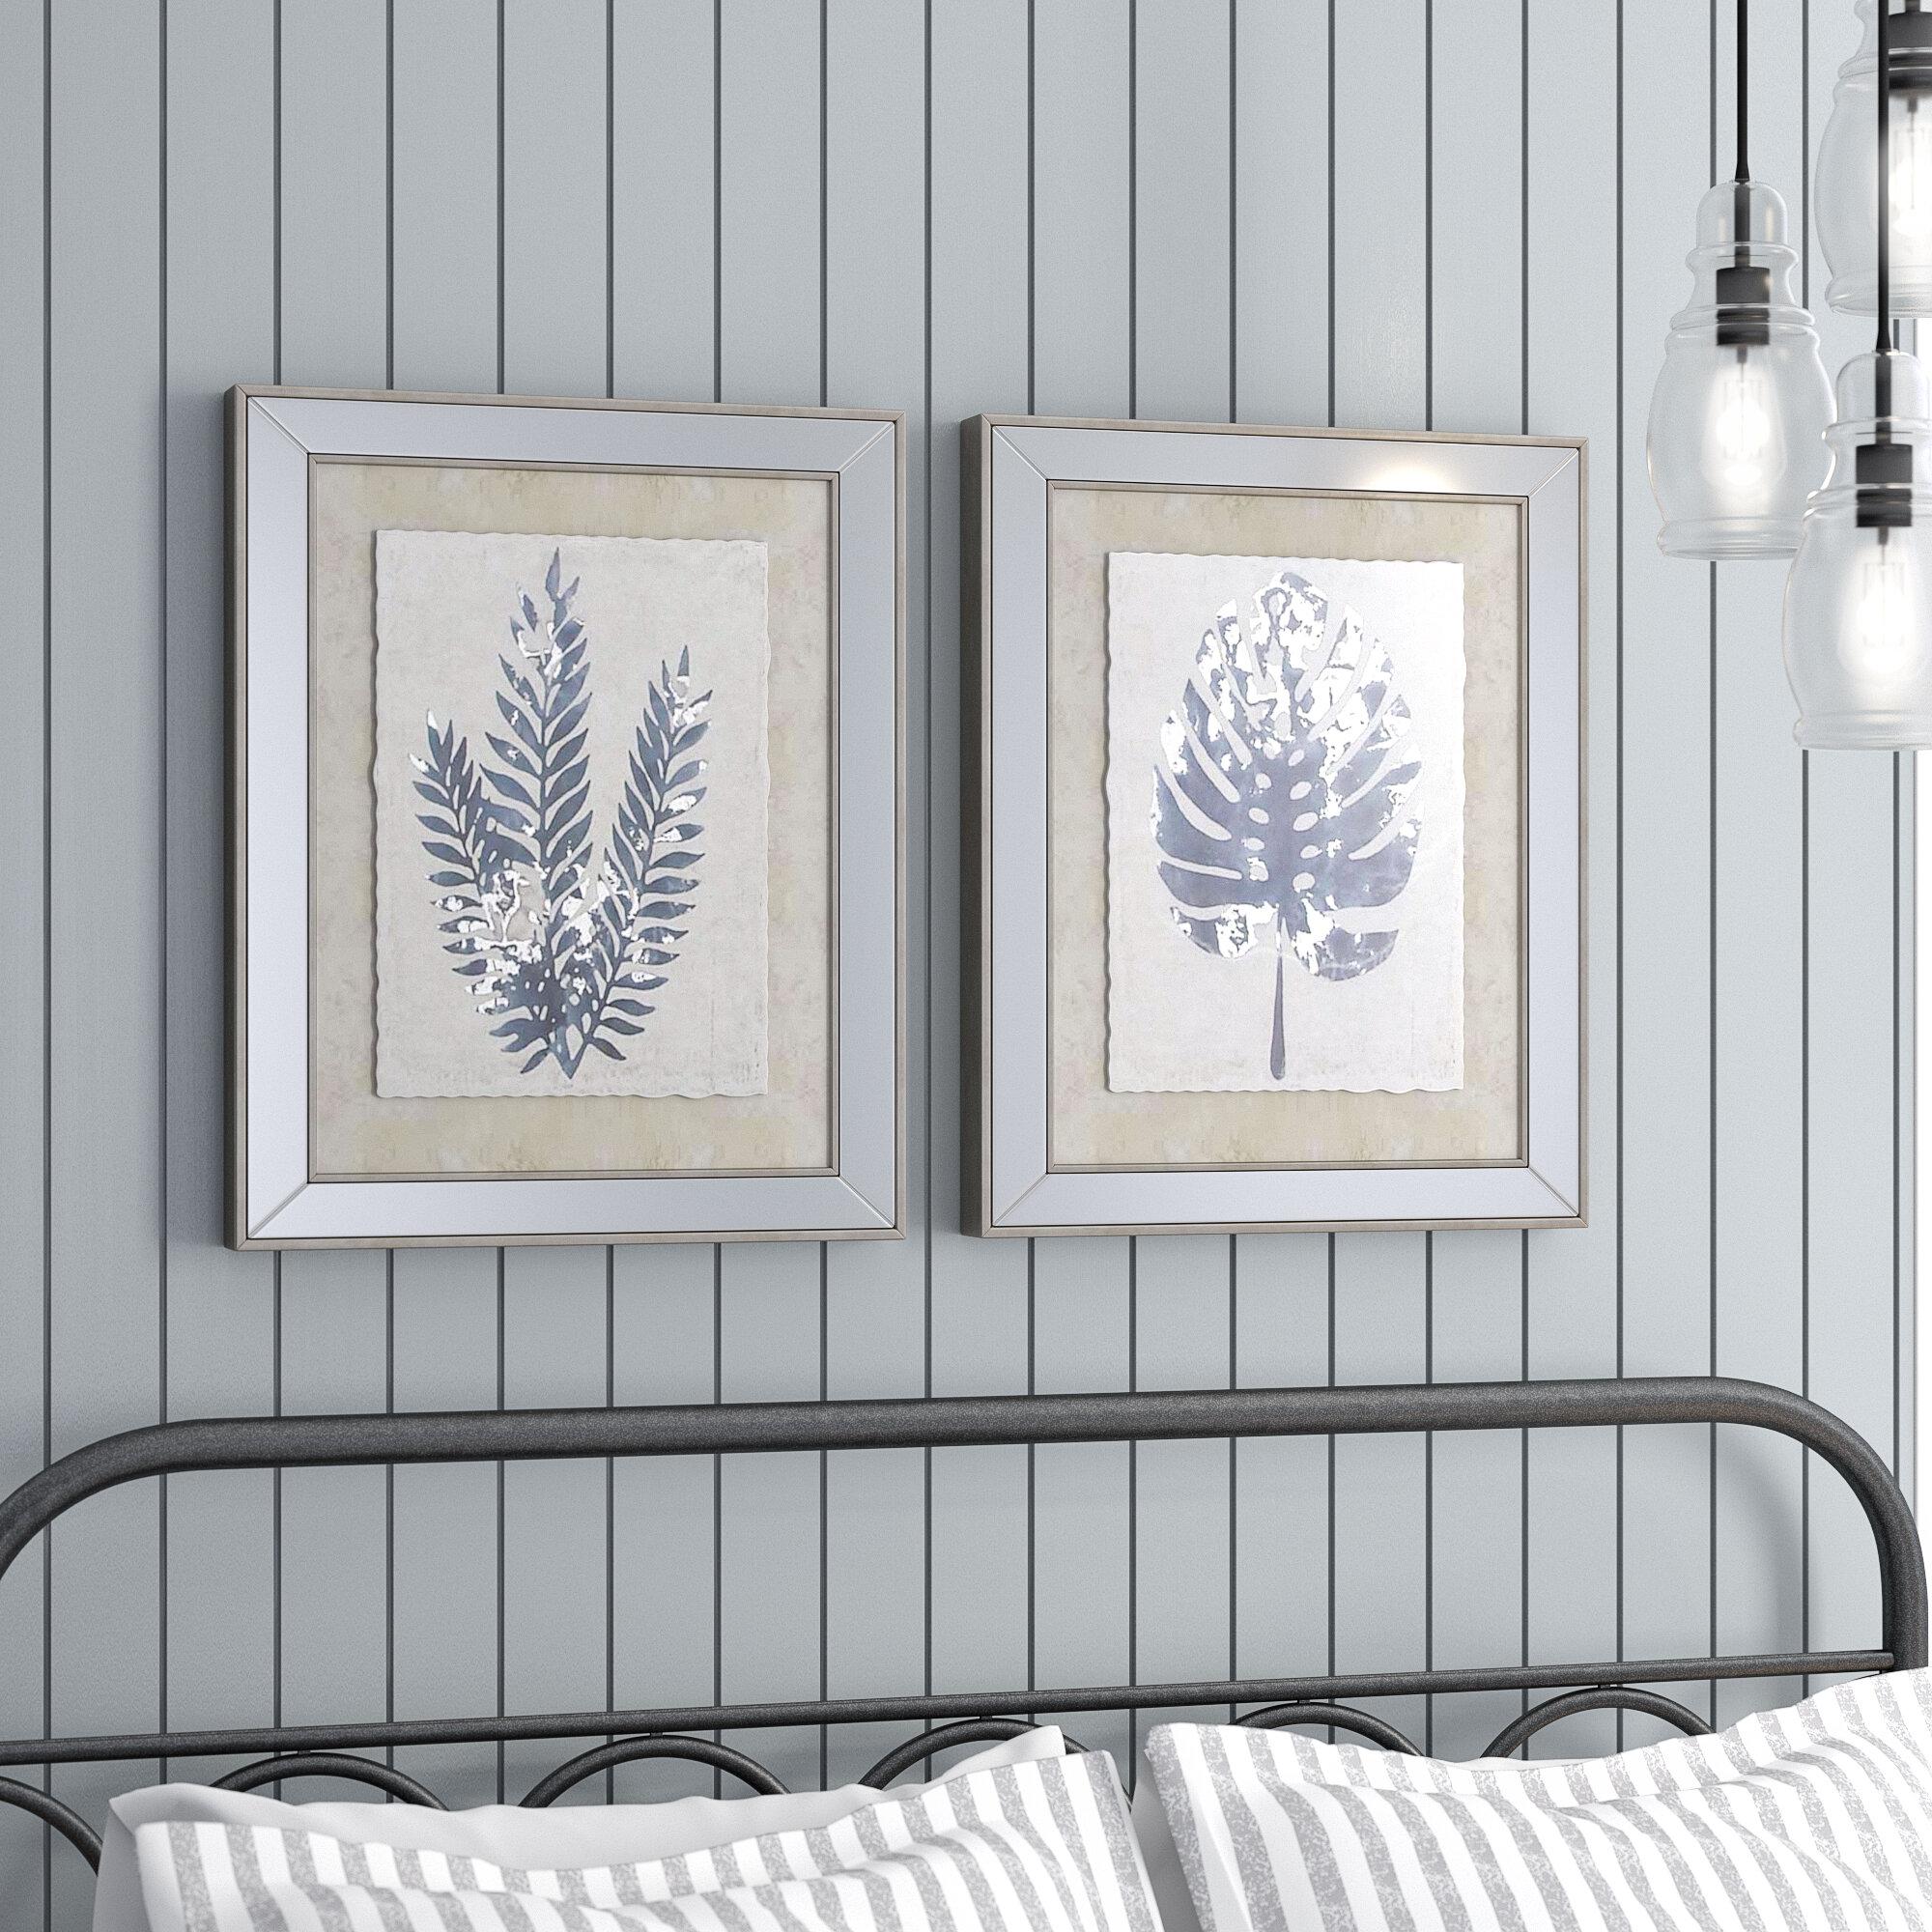 Gracie Oaks \'Modern Leaf Silhouettes\' 2 Piece Framed Graphic Art ...